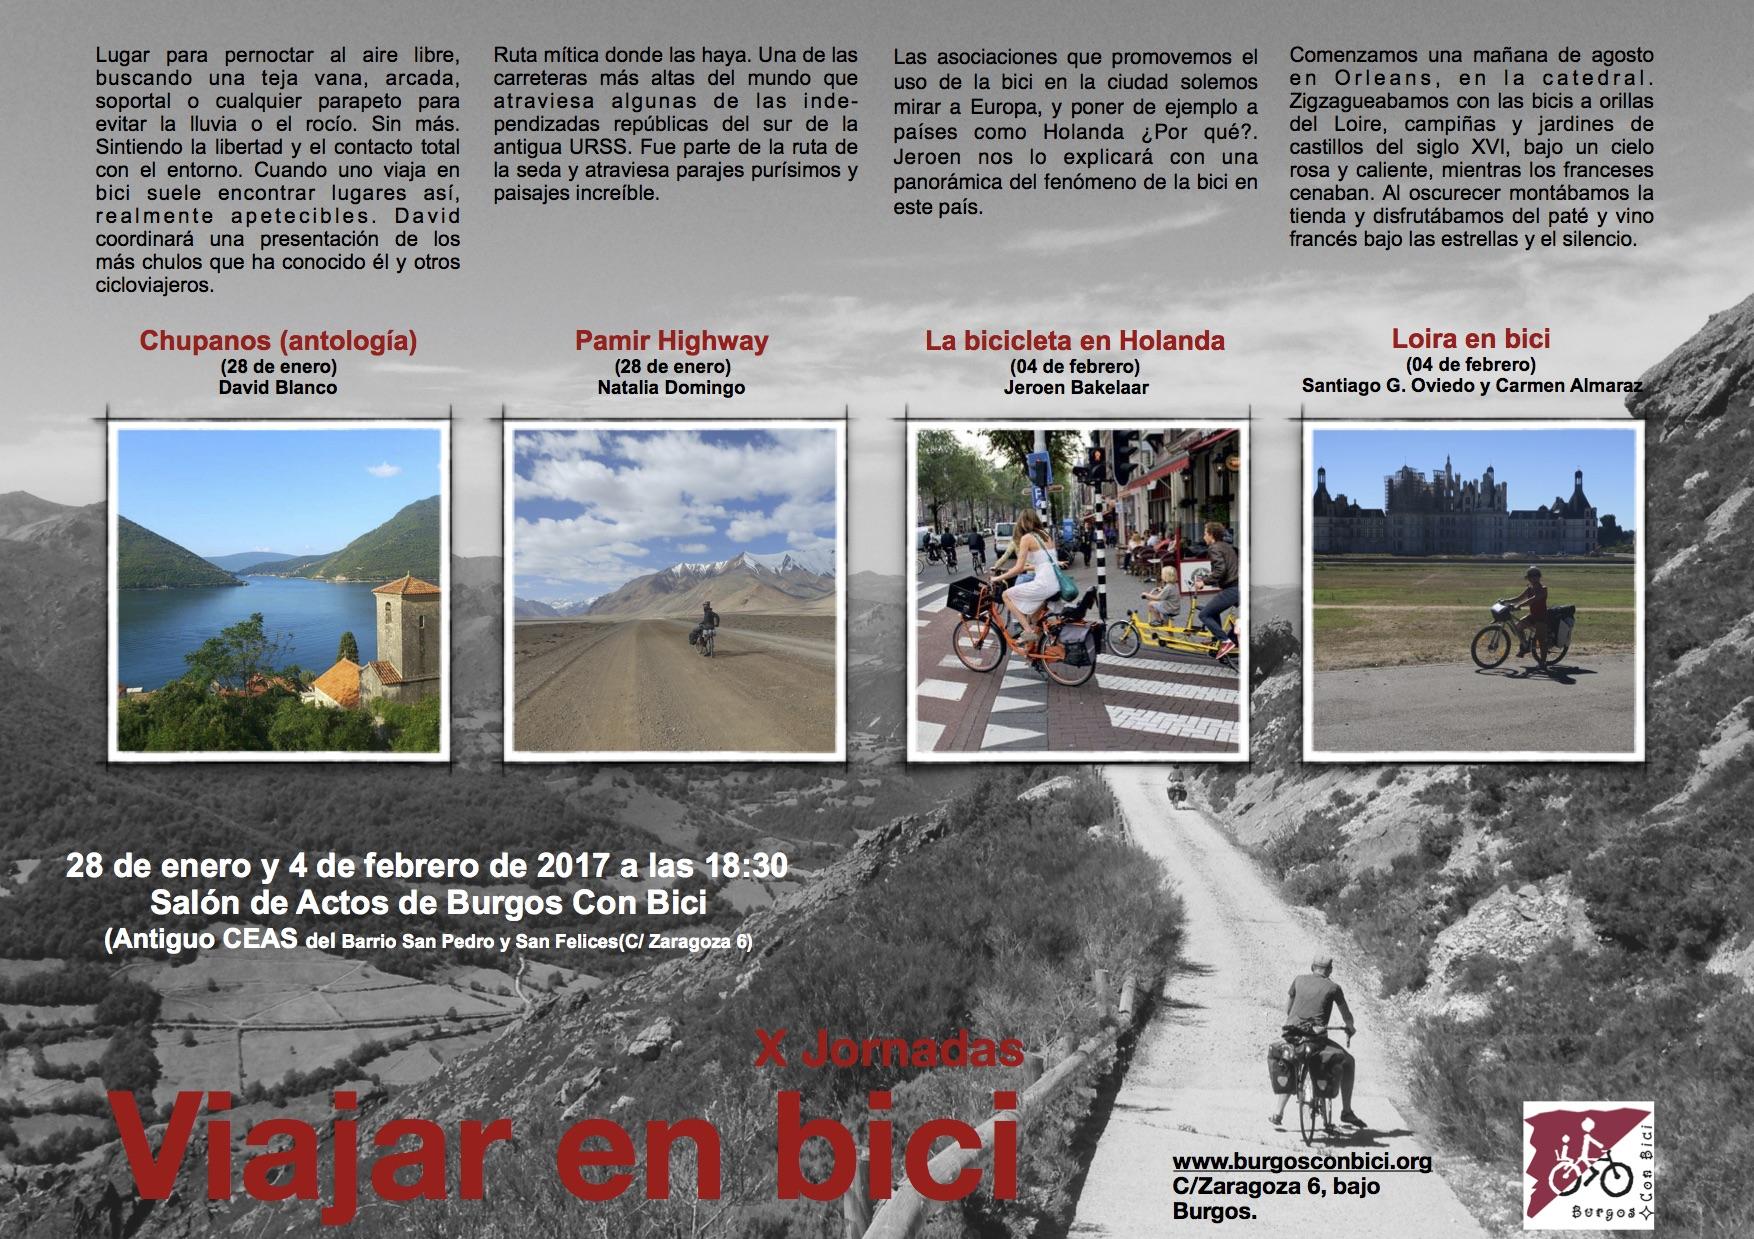 X Jornadas Viajar en Bici. 2017.